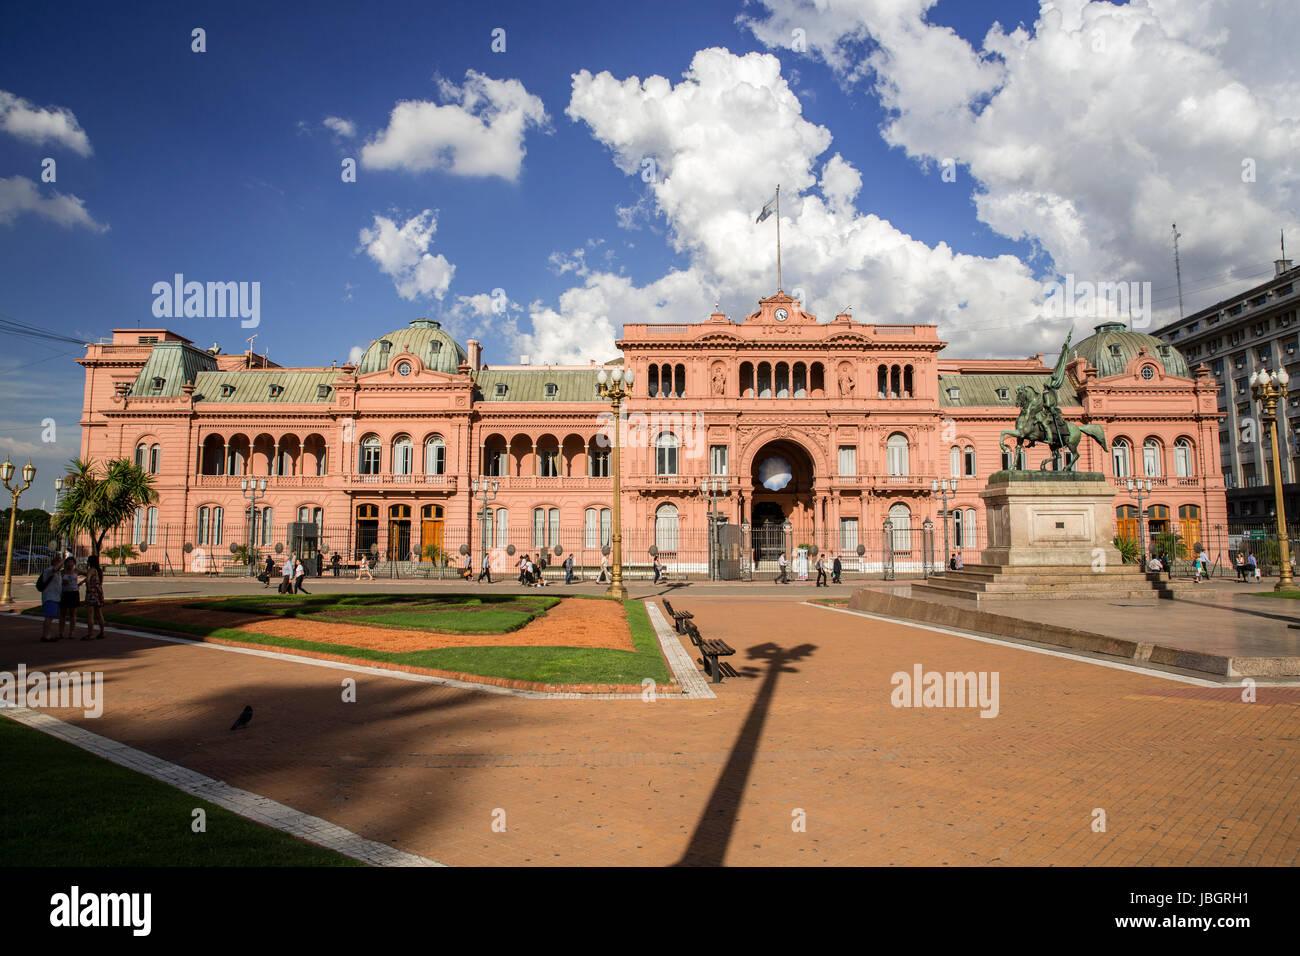 Presidental Palace donde Evita Parone dio su famoso discurso en Buenos Aires, Argentina Imagen De Stock